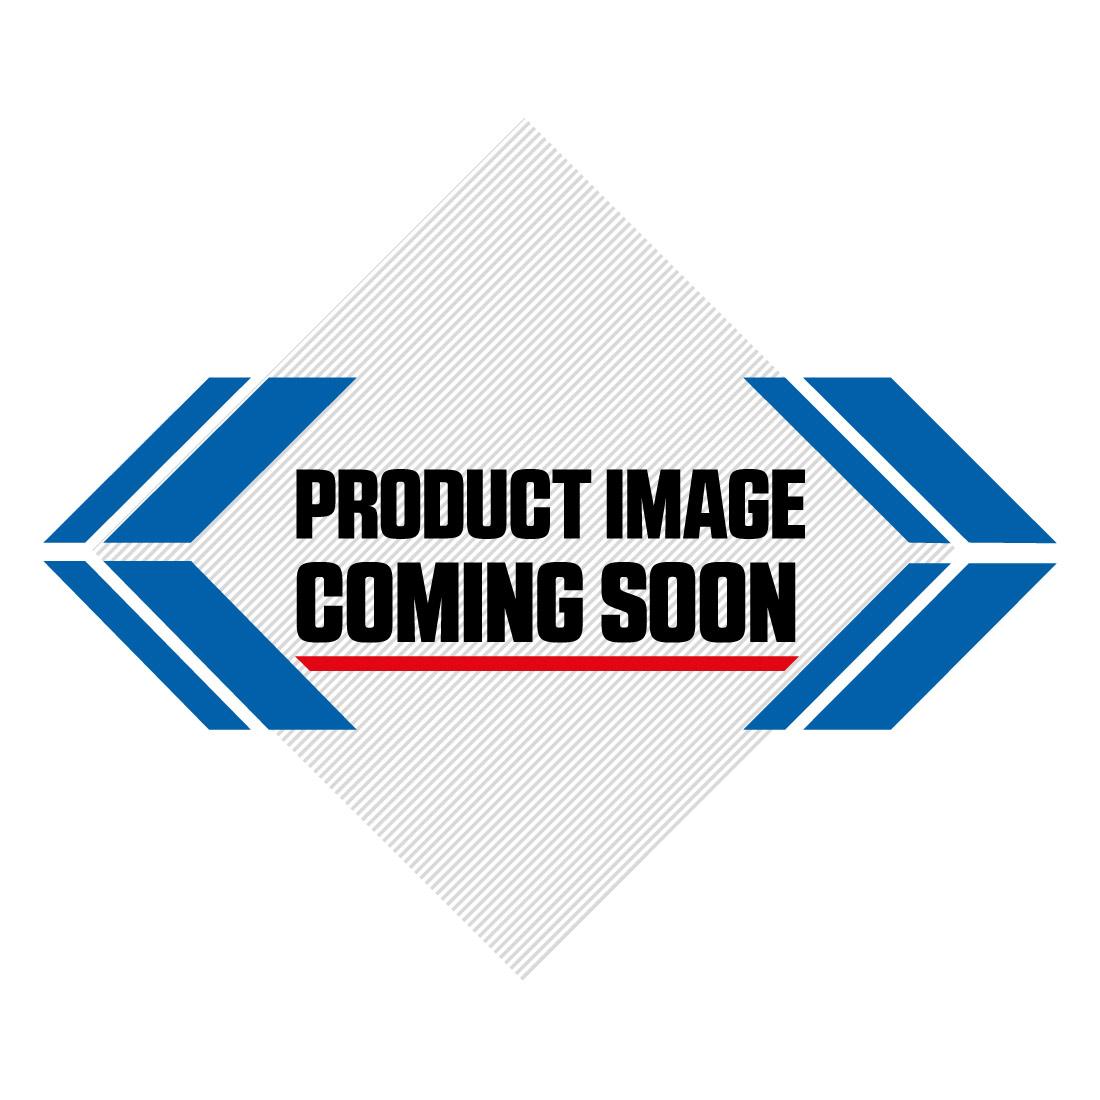 Suzuki Plastic Kit RMZ 450 (08-17) Black Image-5>